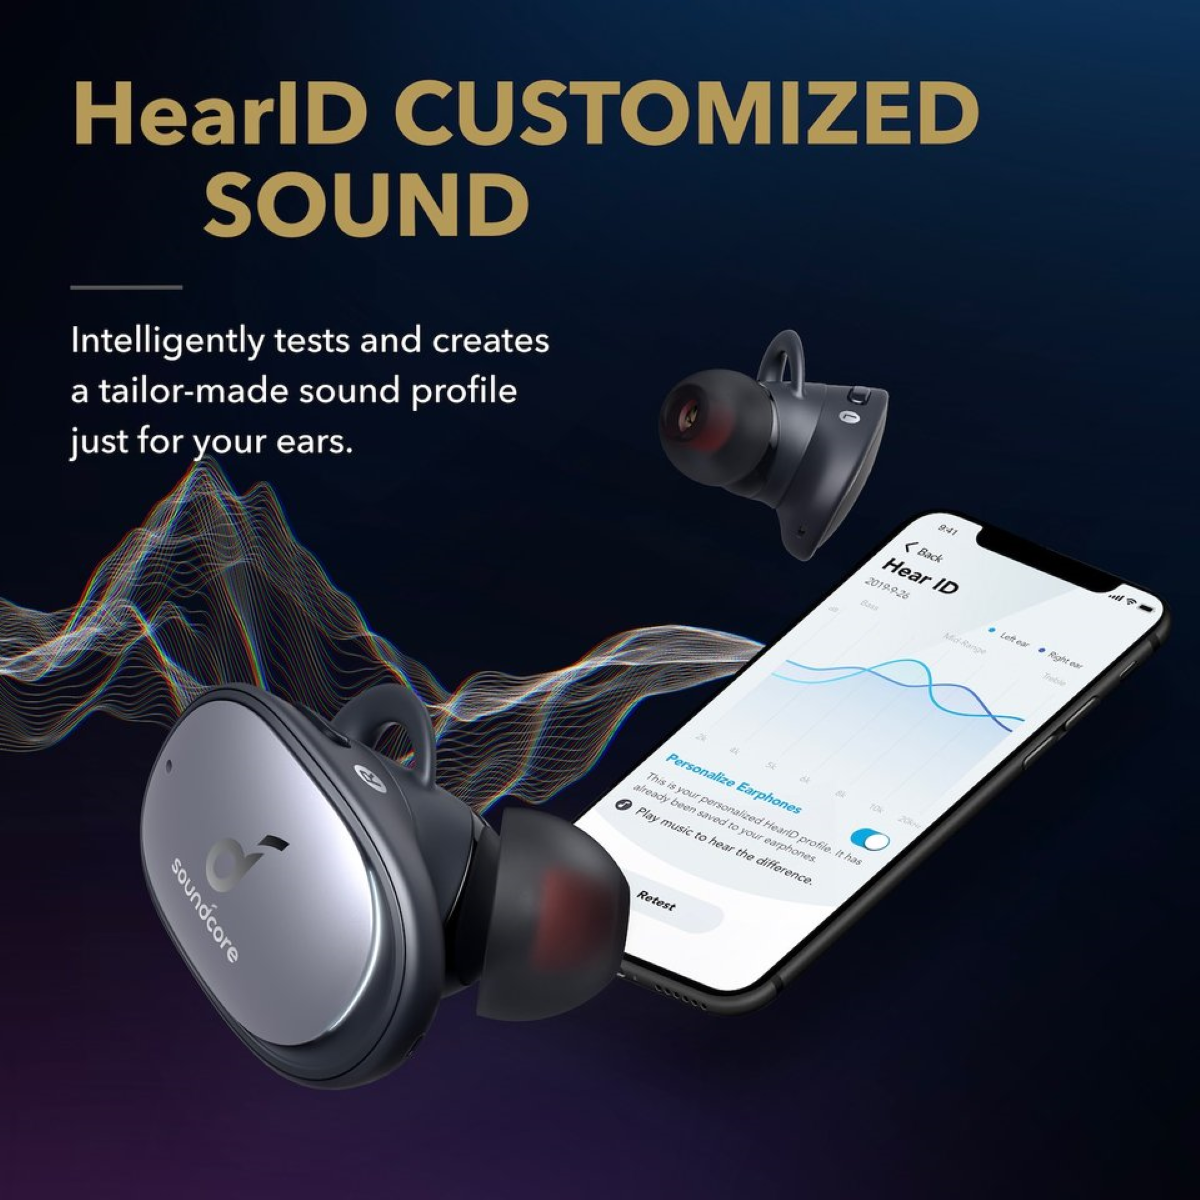 Customized Sound Profiles - HearID Custom Sound